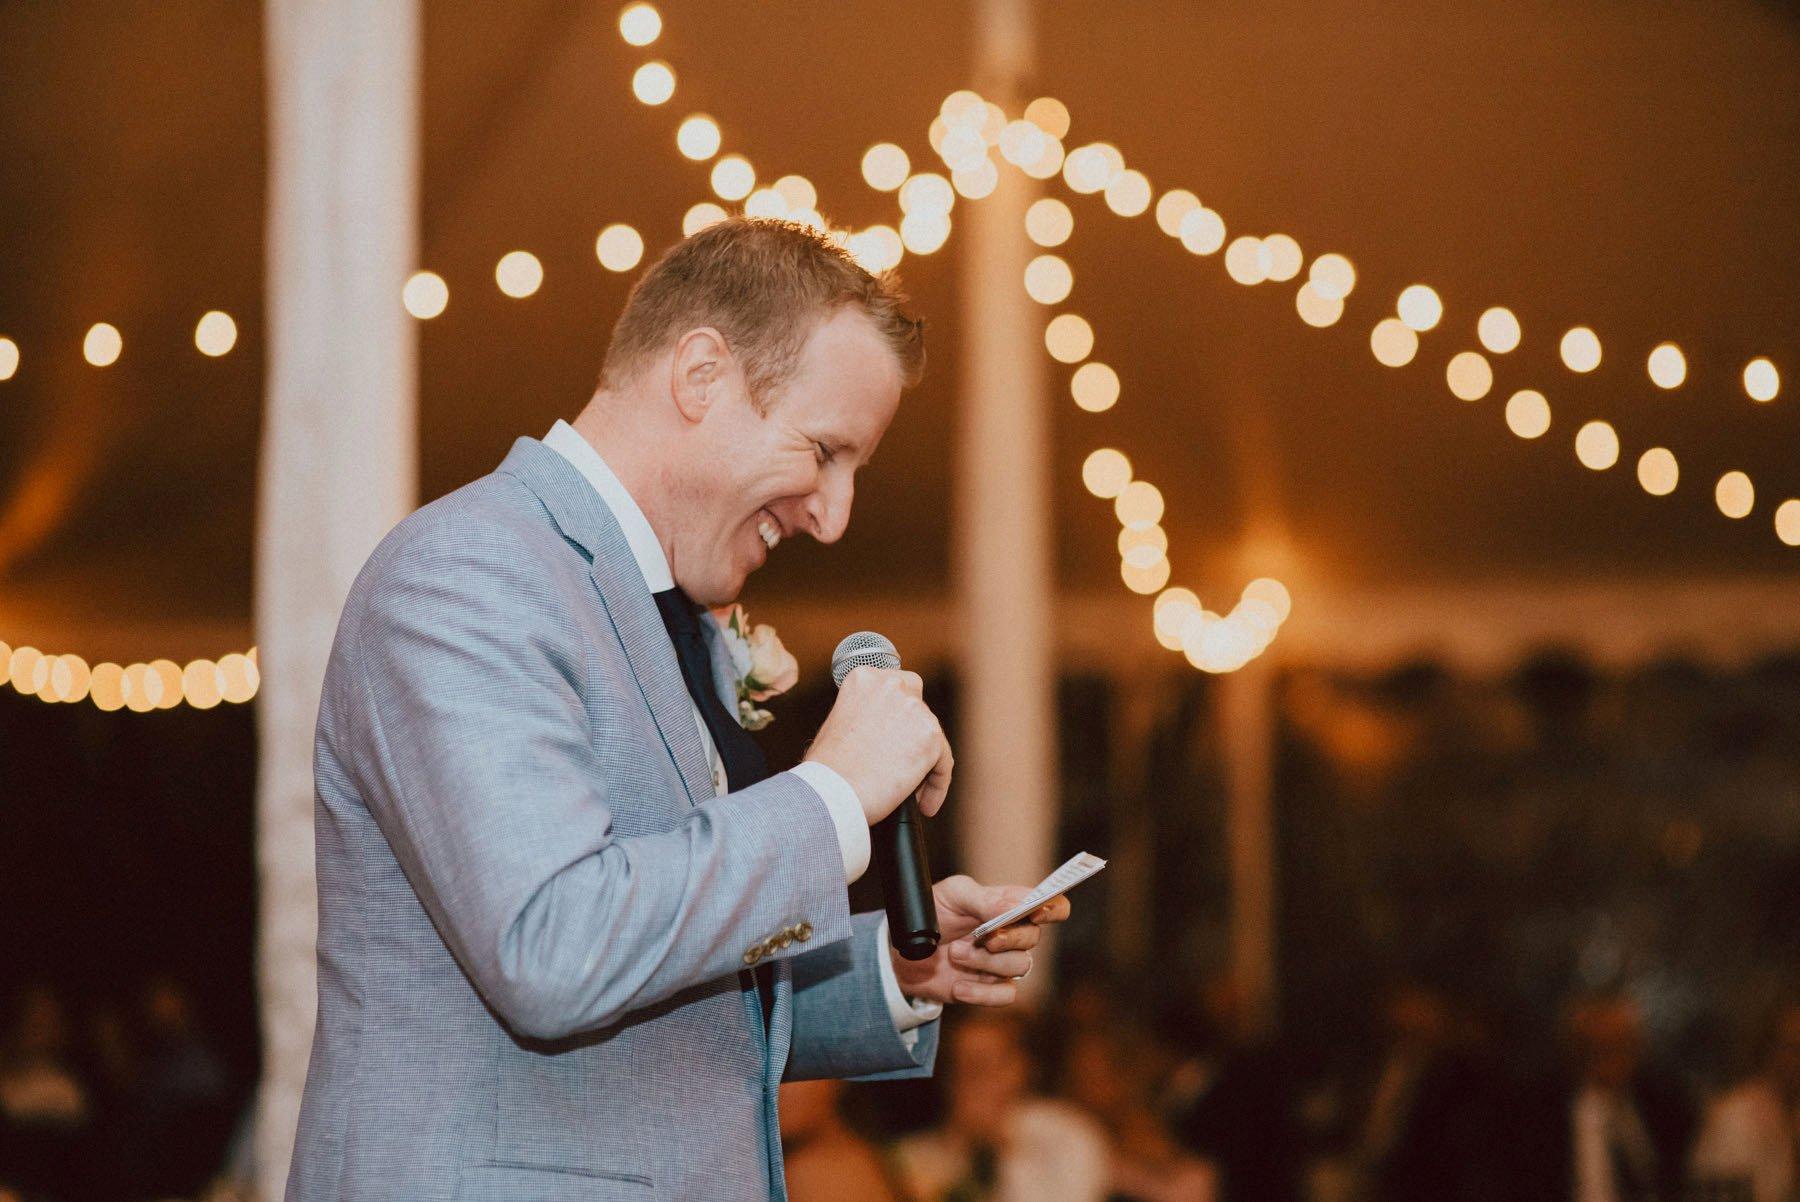 greenville-country-club-wedding-138.jpg